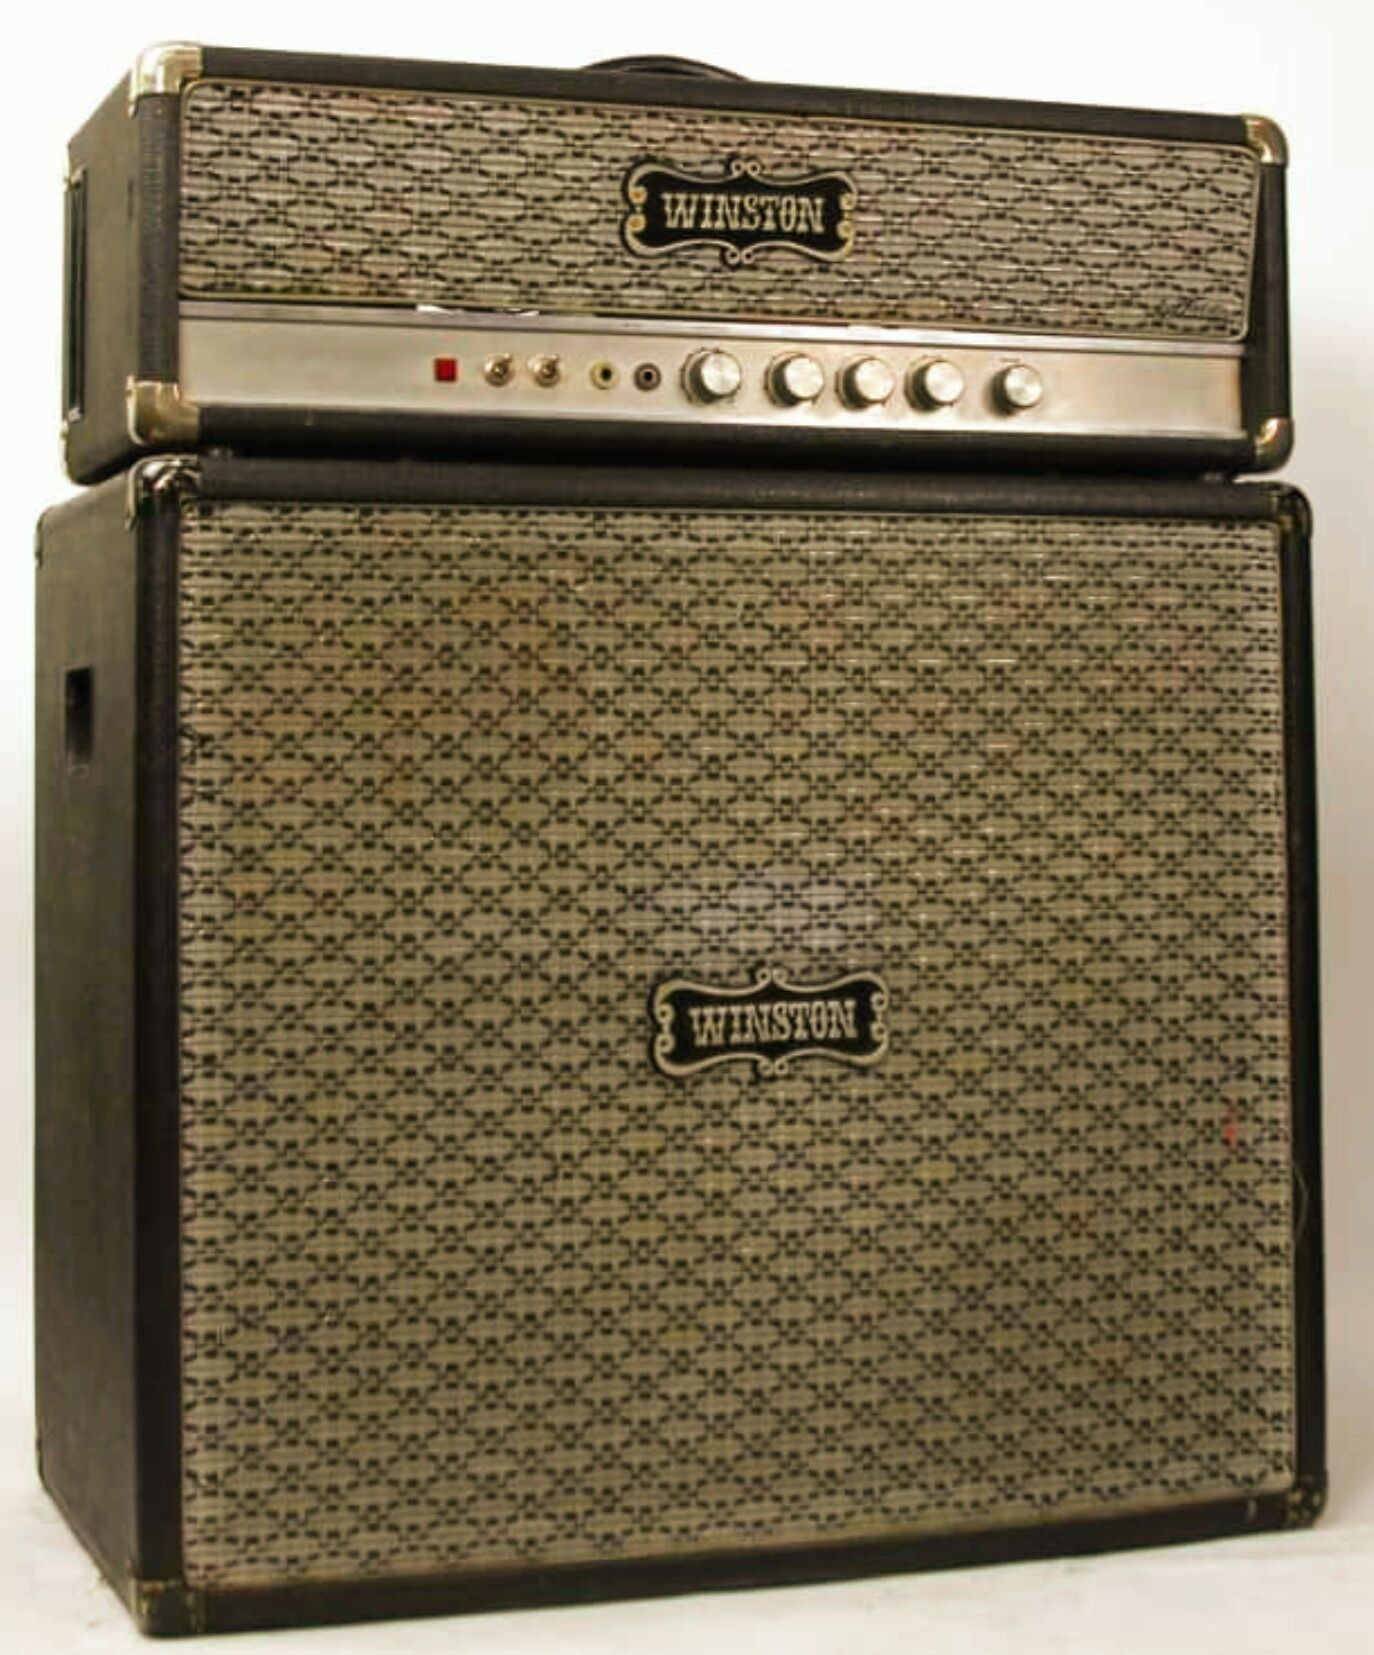 1970 winston ba 200  made by echolette (de) germanium ss pre- amp w/ four  el34 & two 85 watt 12inch fane speakers  great early hiwatt sound  save  schematic